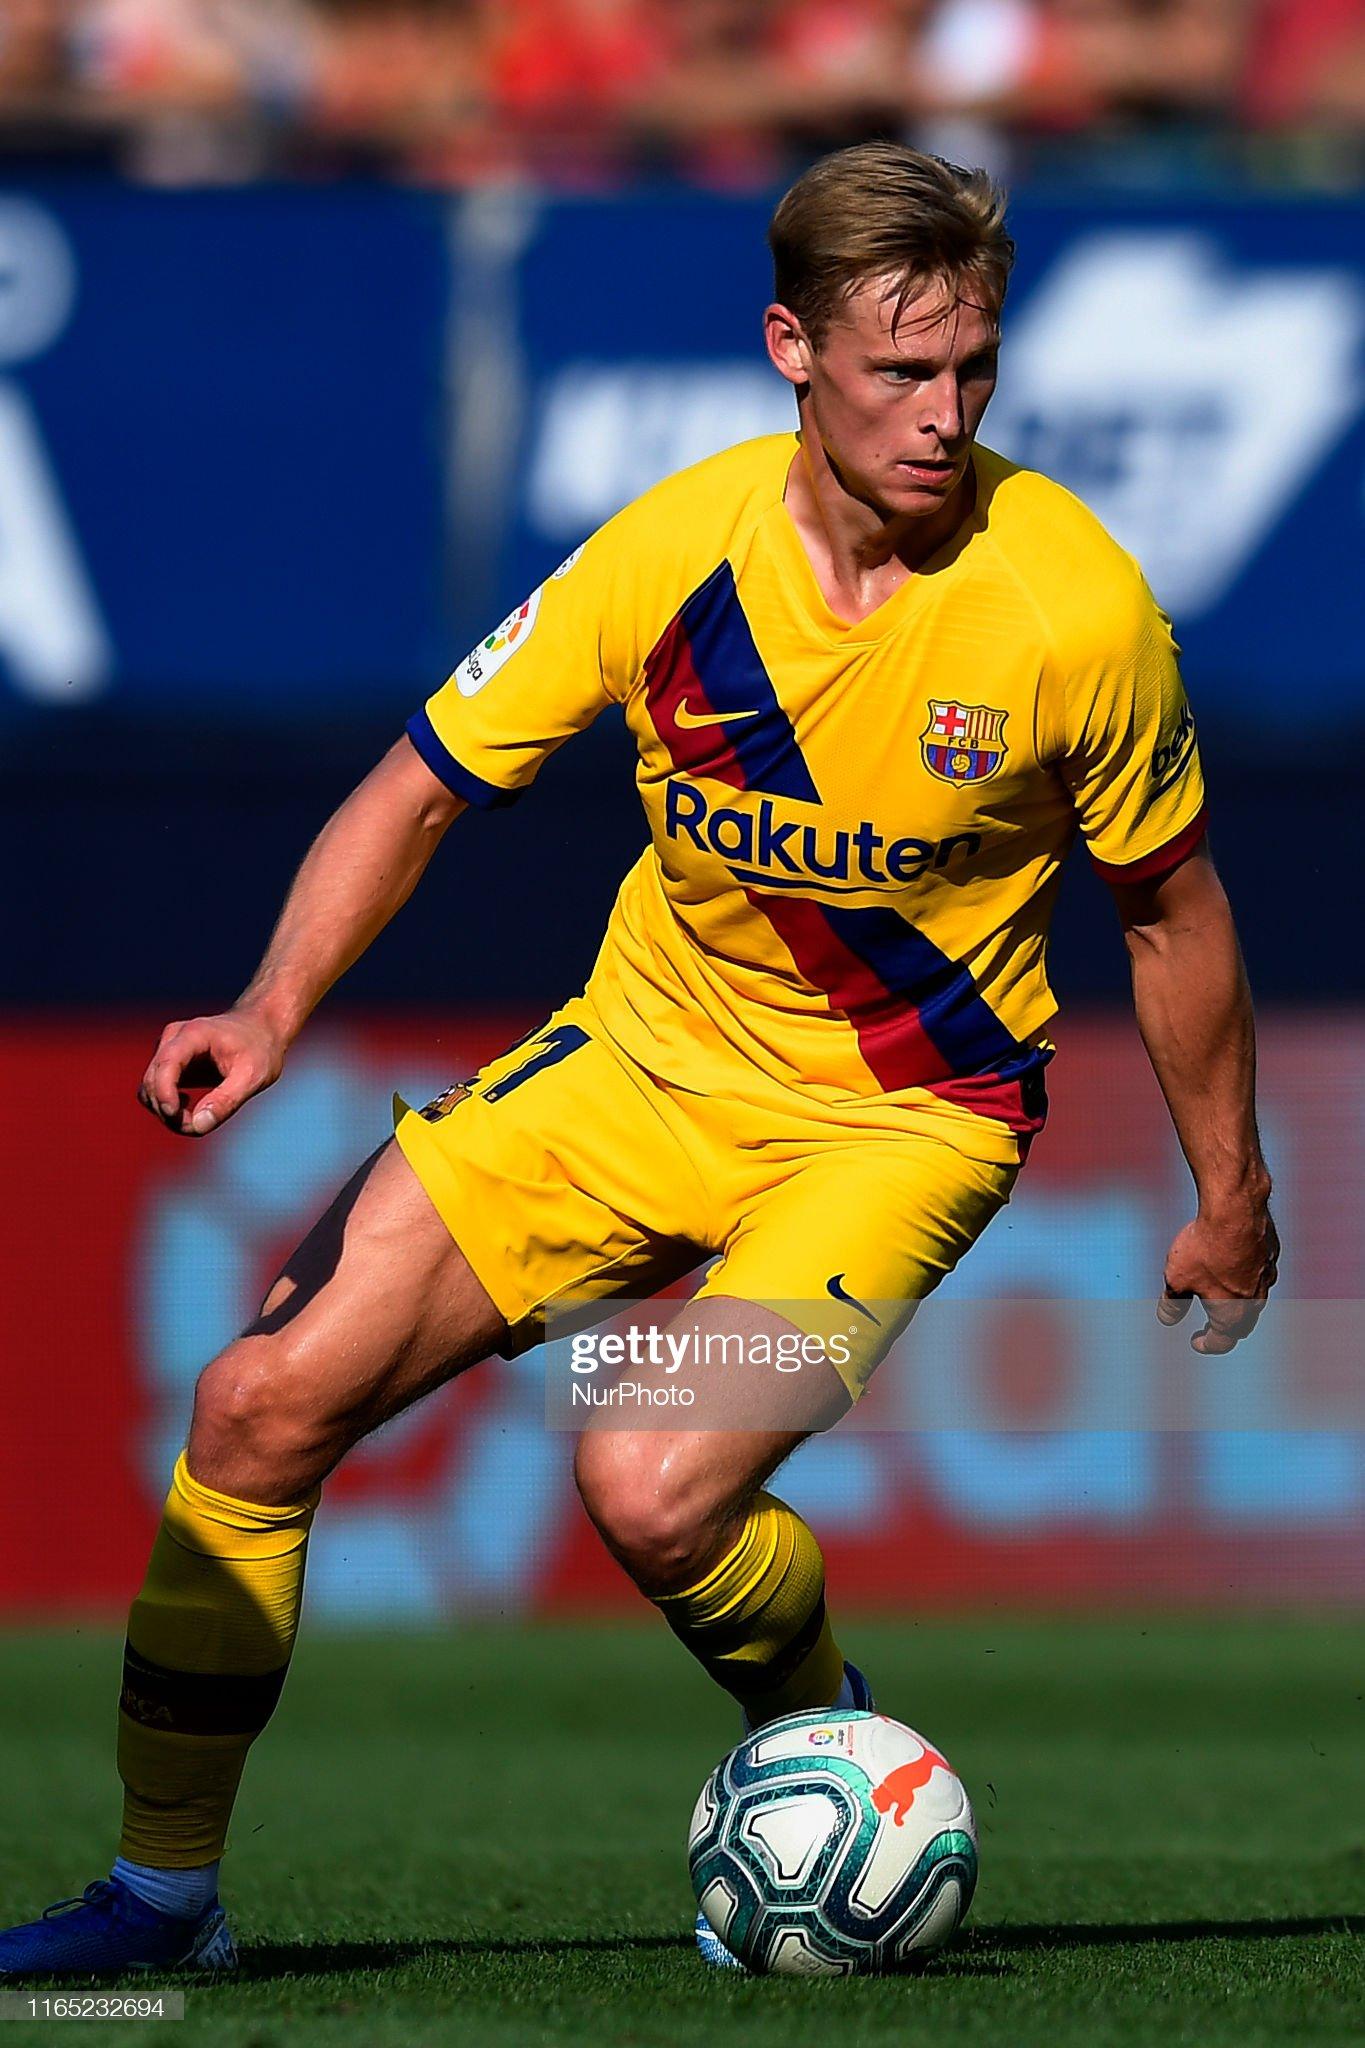 صور مباراة : أوساسونا - برشلونة 2-2 ( 31-08-2019 )  Frenkie-de-jong-of-barcelona-in-action-during-the-liga-match-between-picture-id1165232694?s=2048x2048